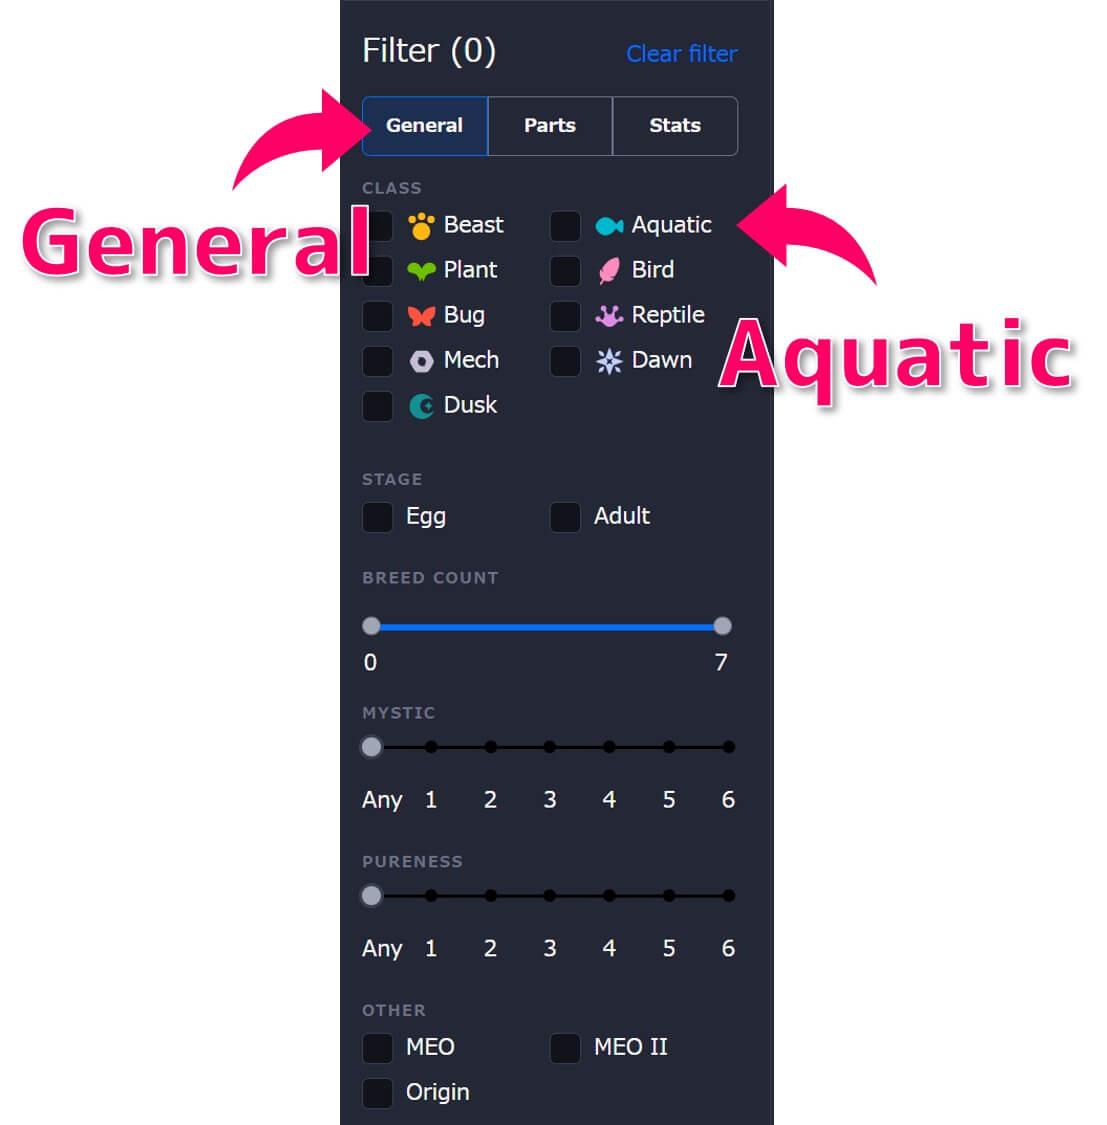 「General」タブから「Aquatic」にチェック